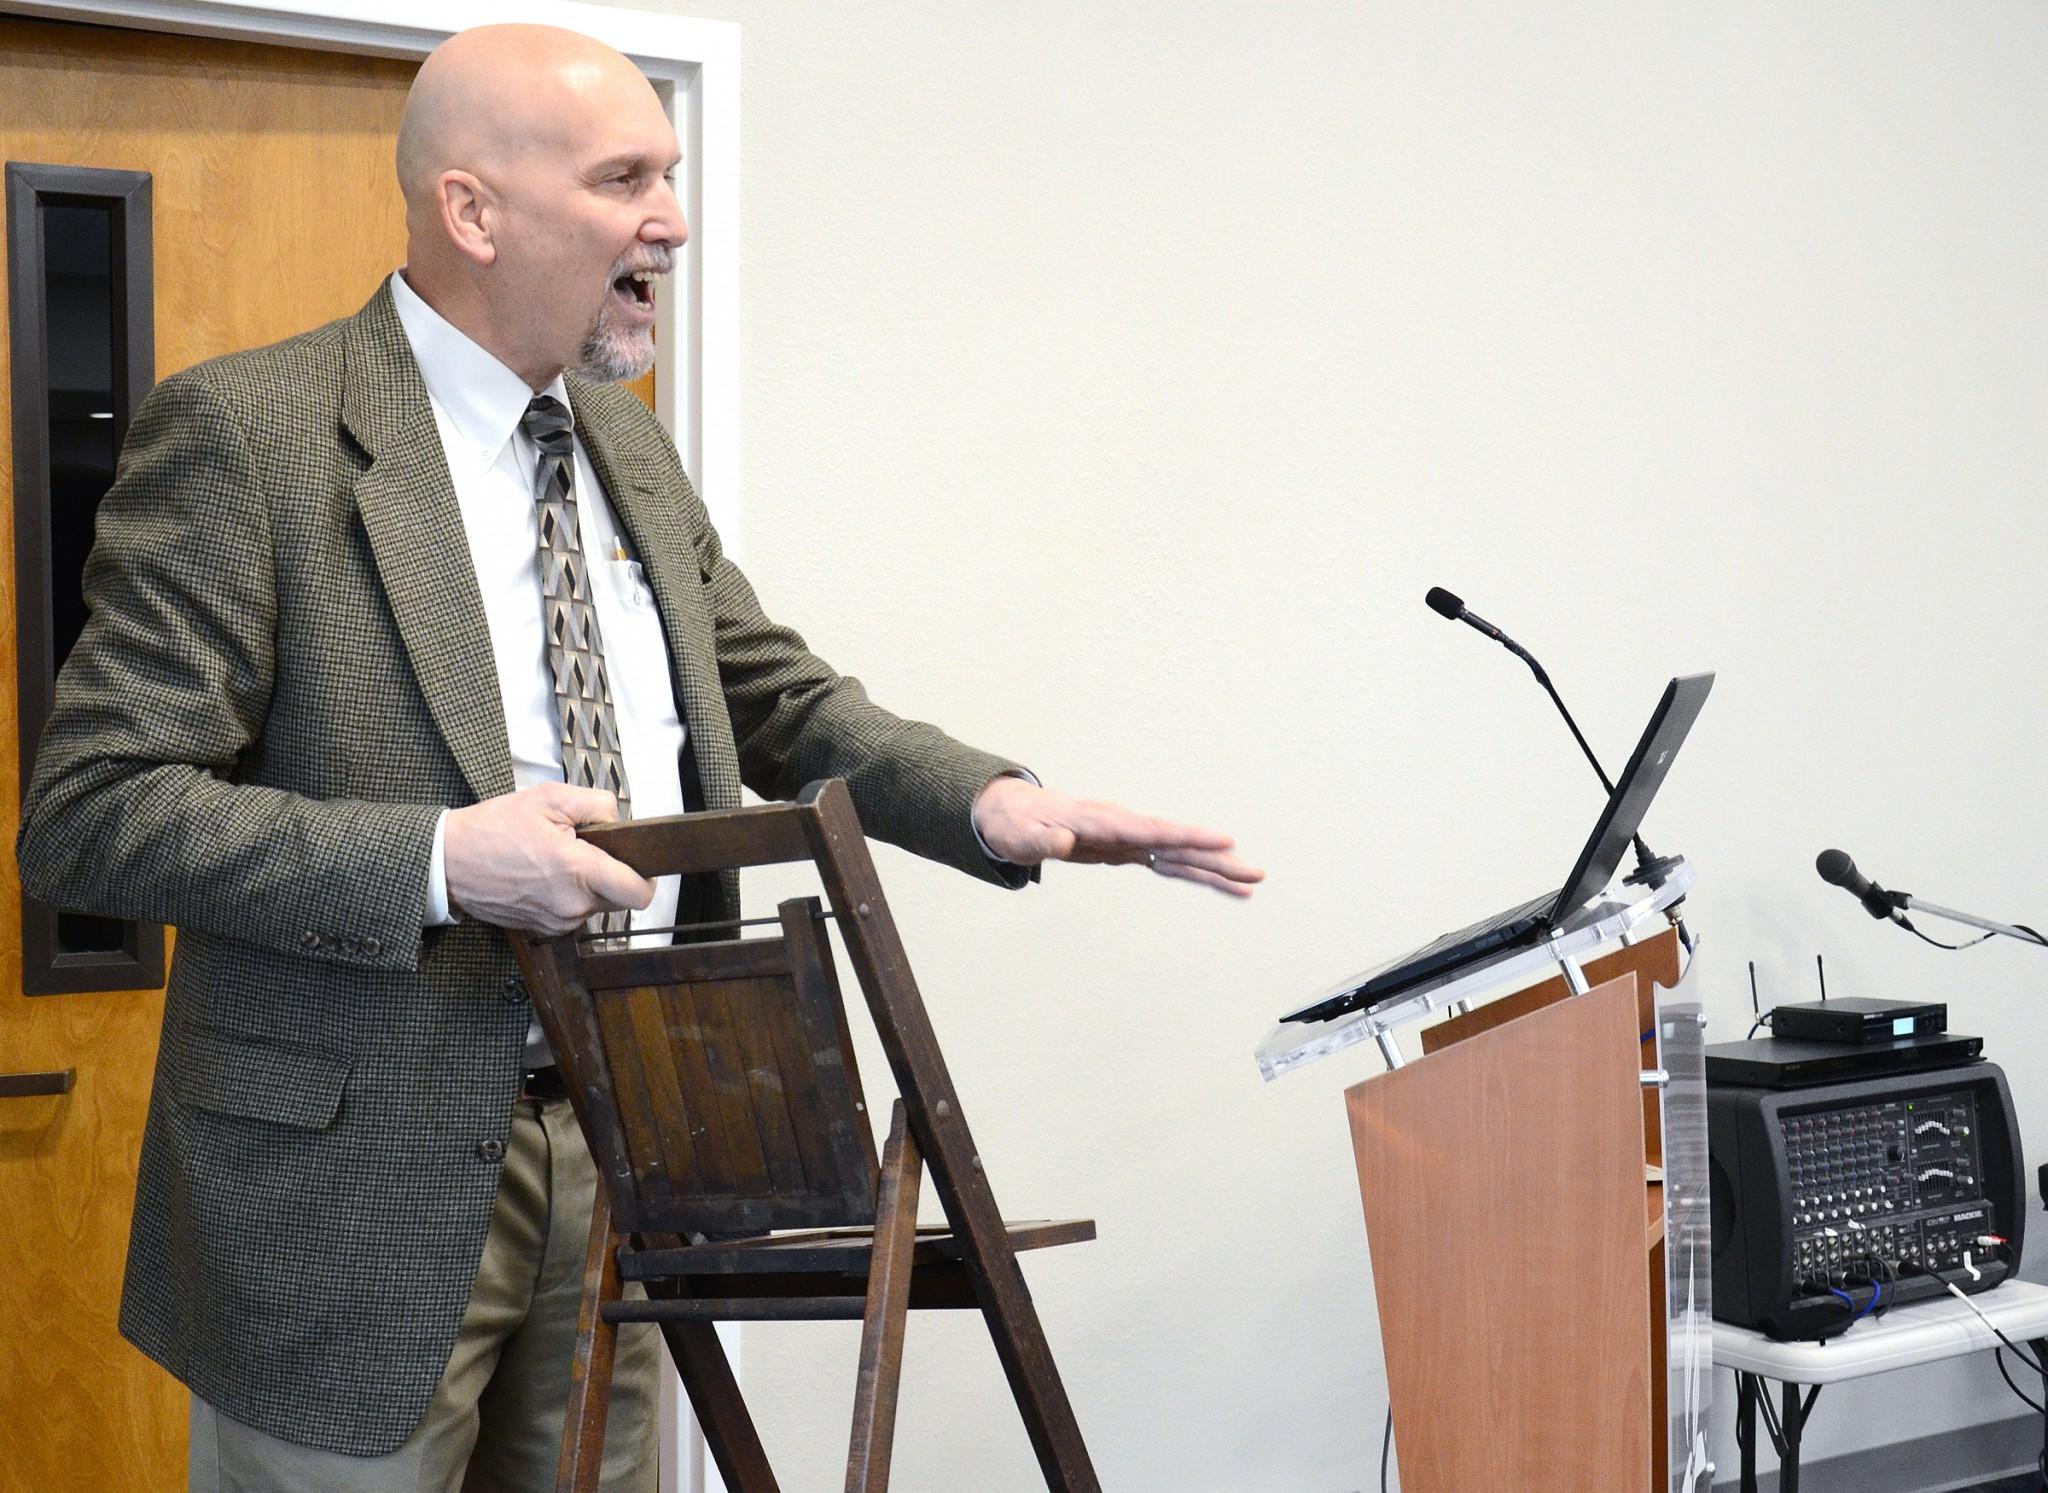 Gary Reimer was a guest speaker at the event. (Press photo by Ken Grosjean)